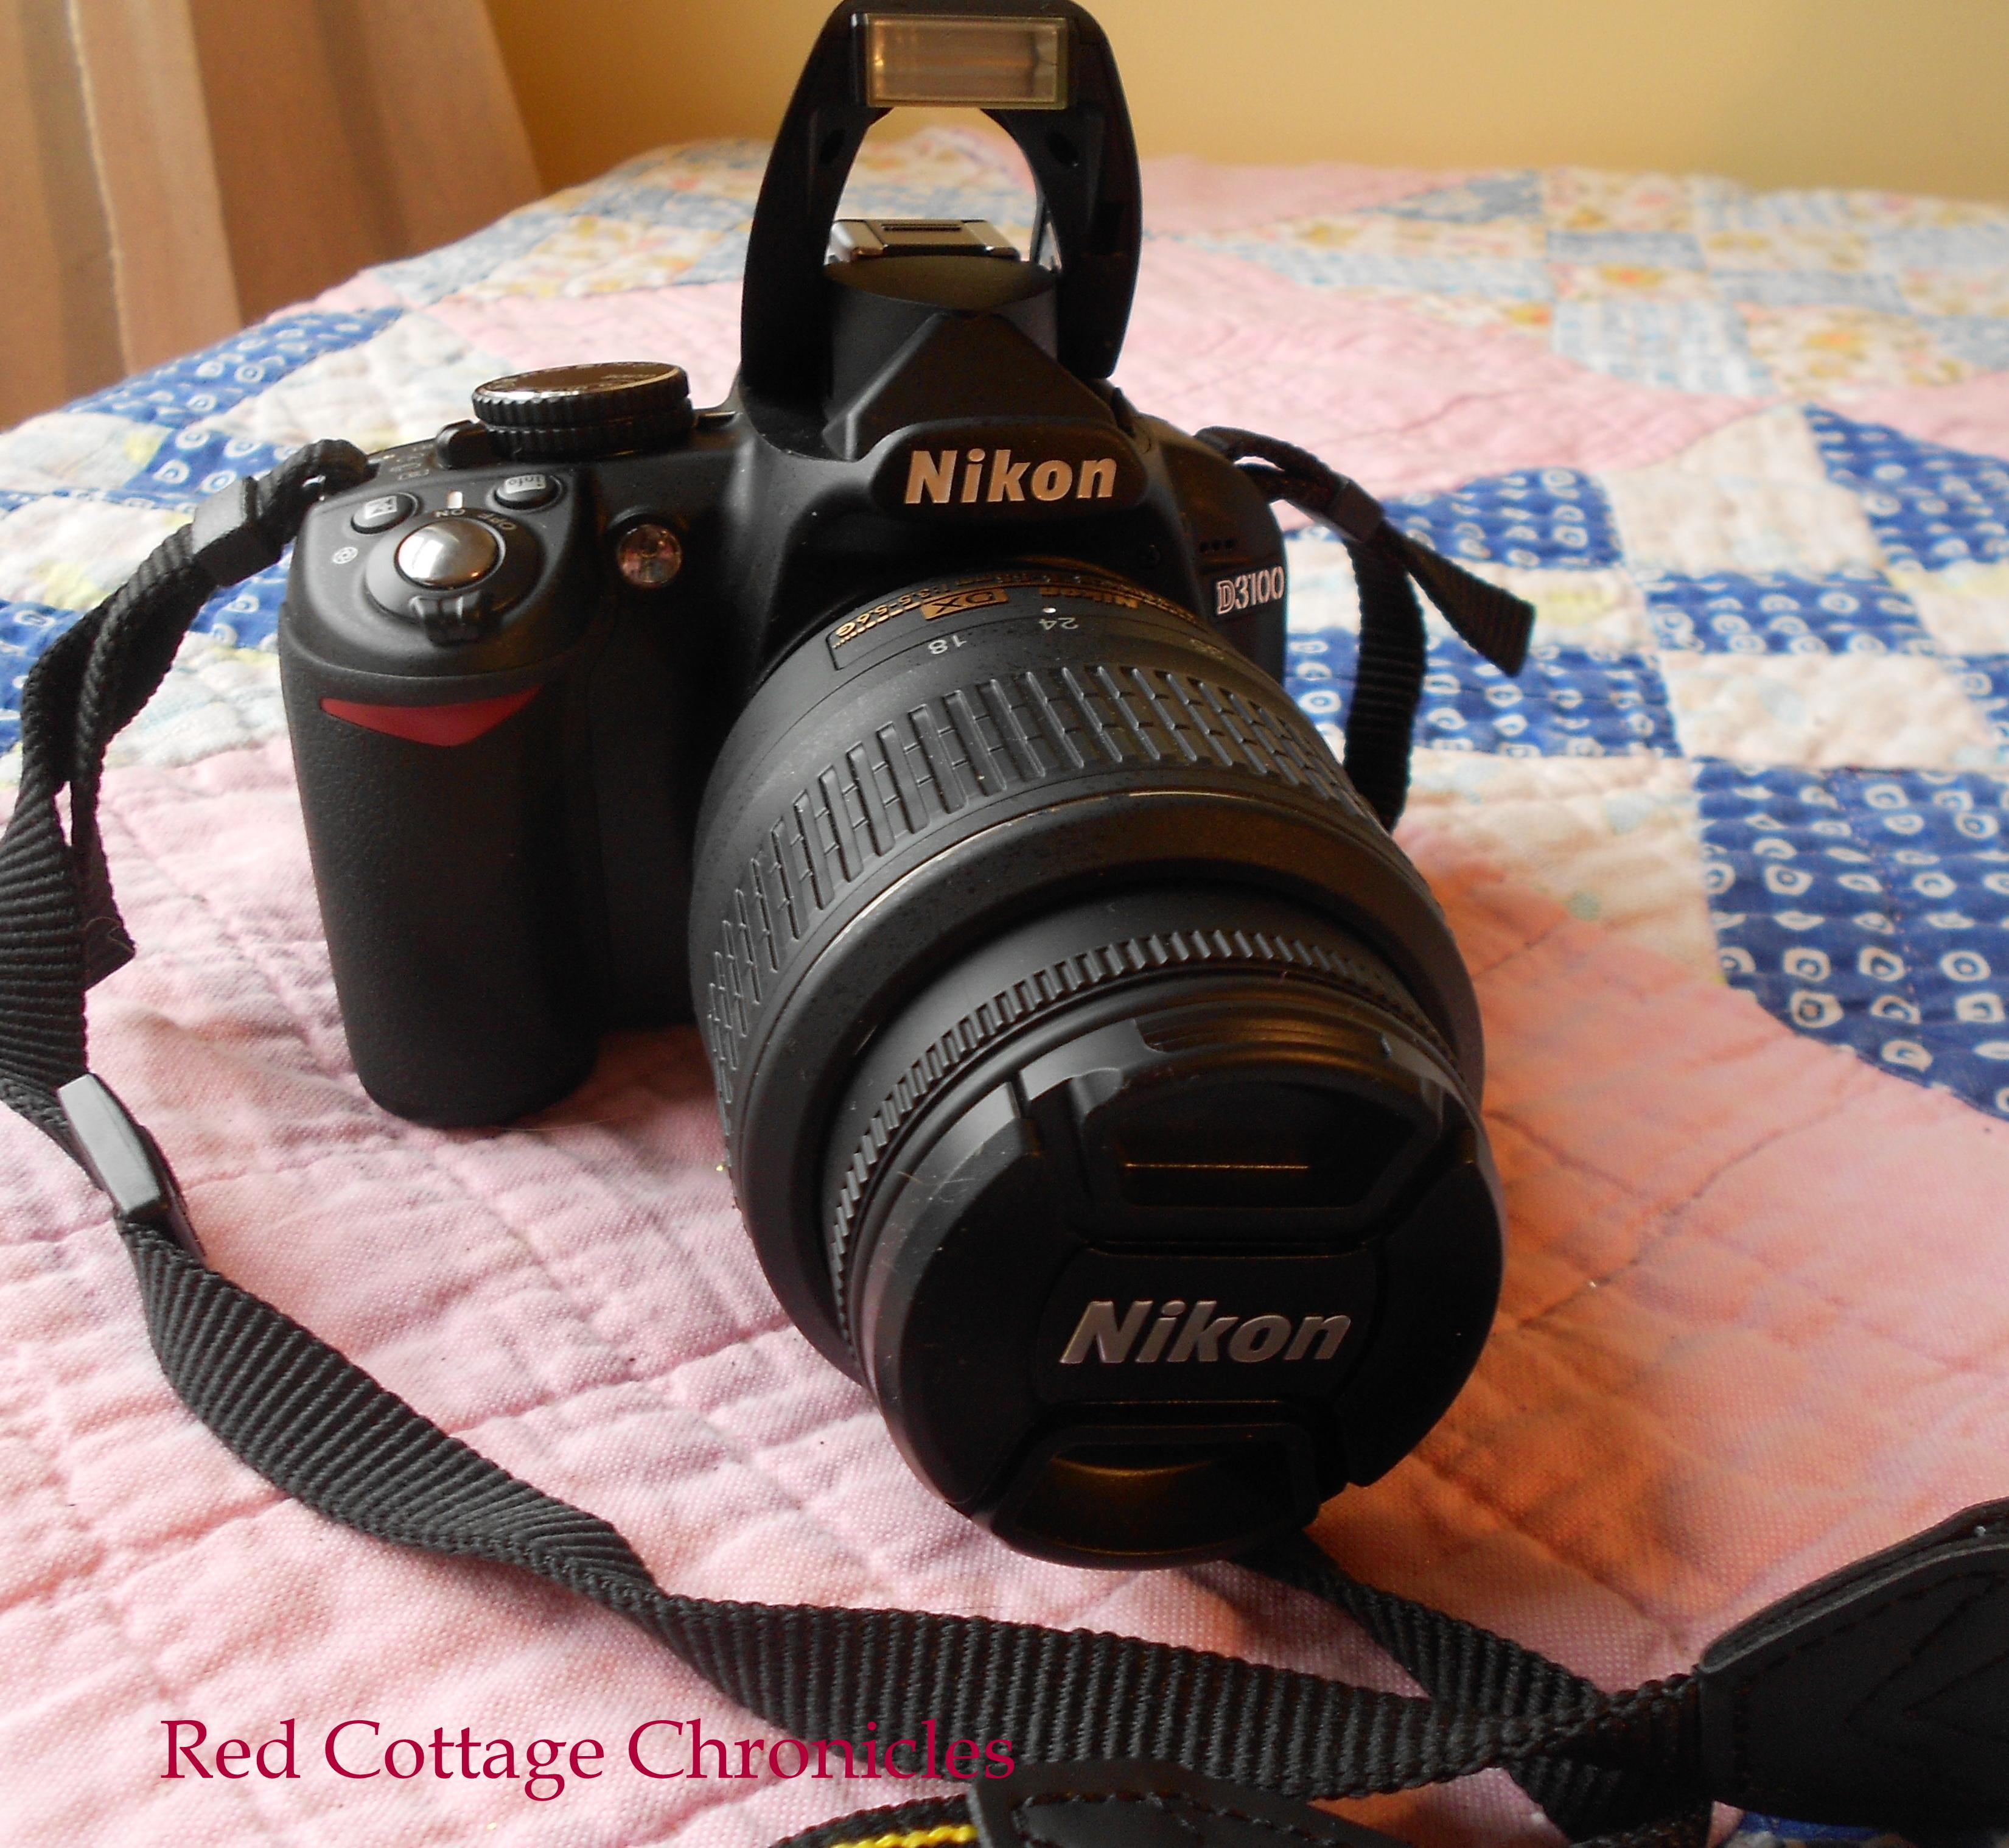 Photography 101!